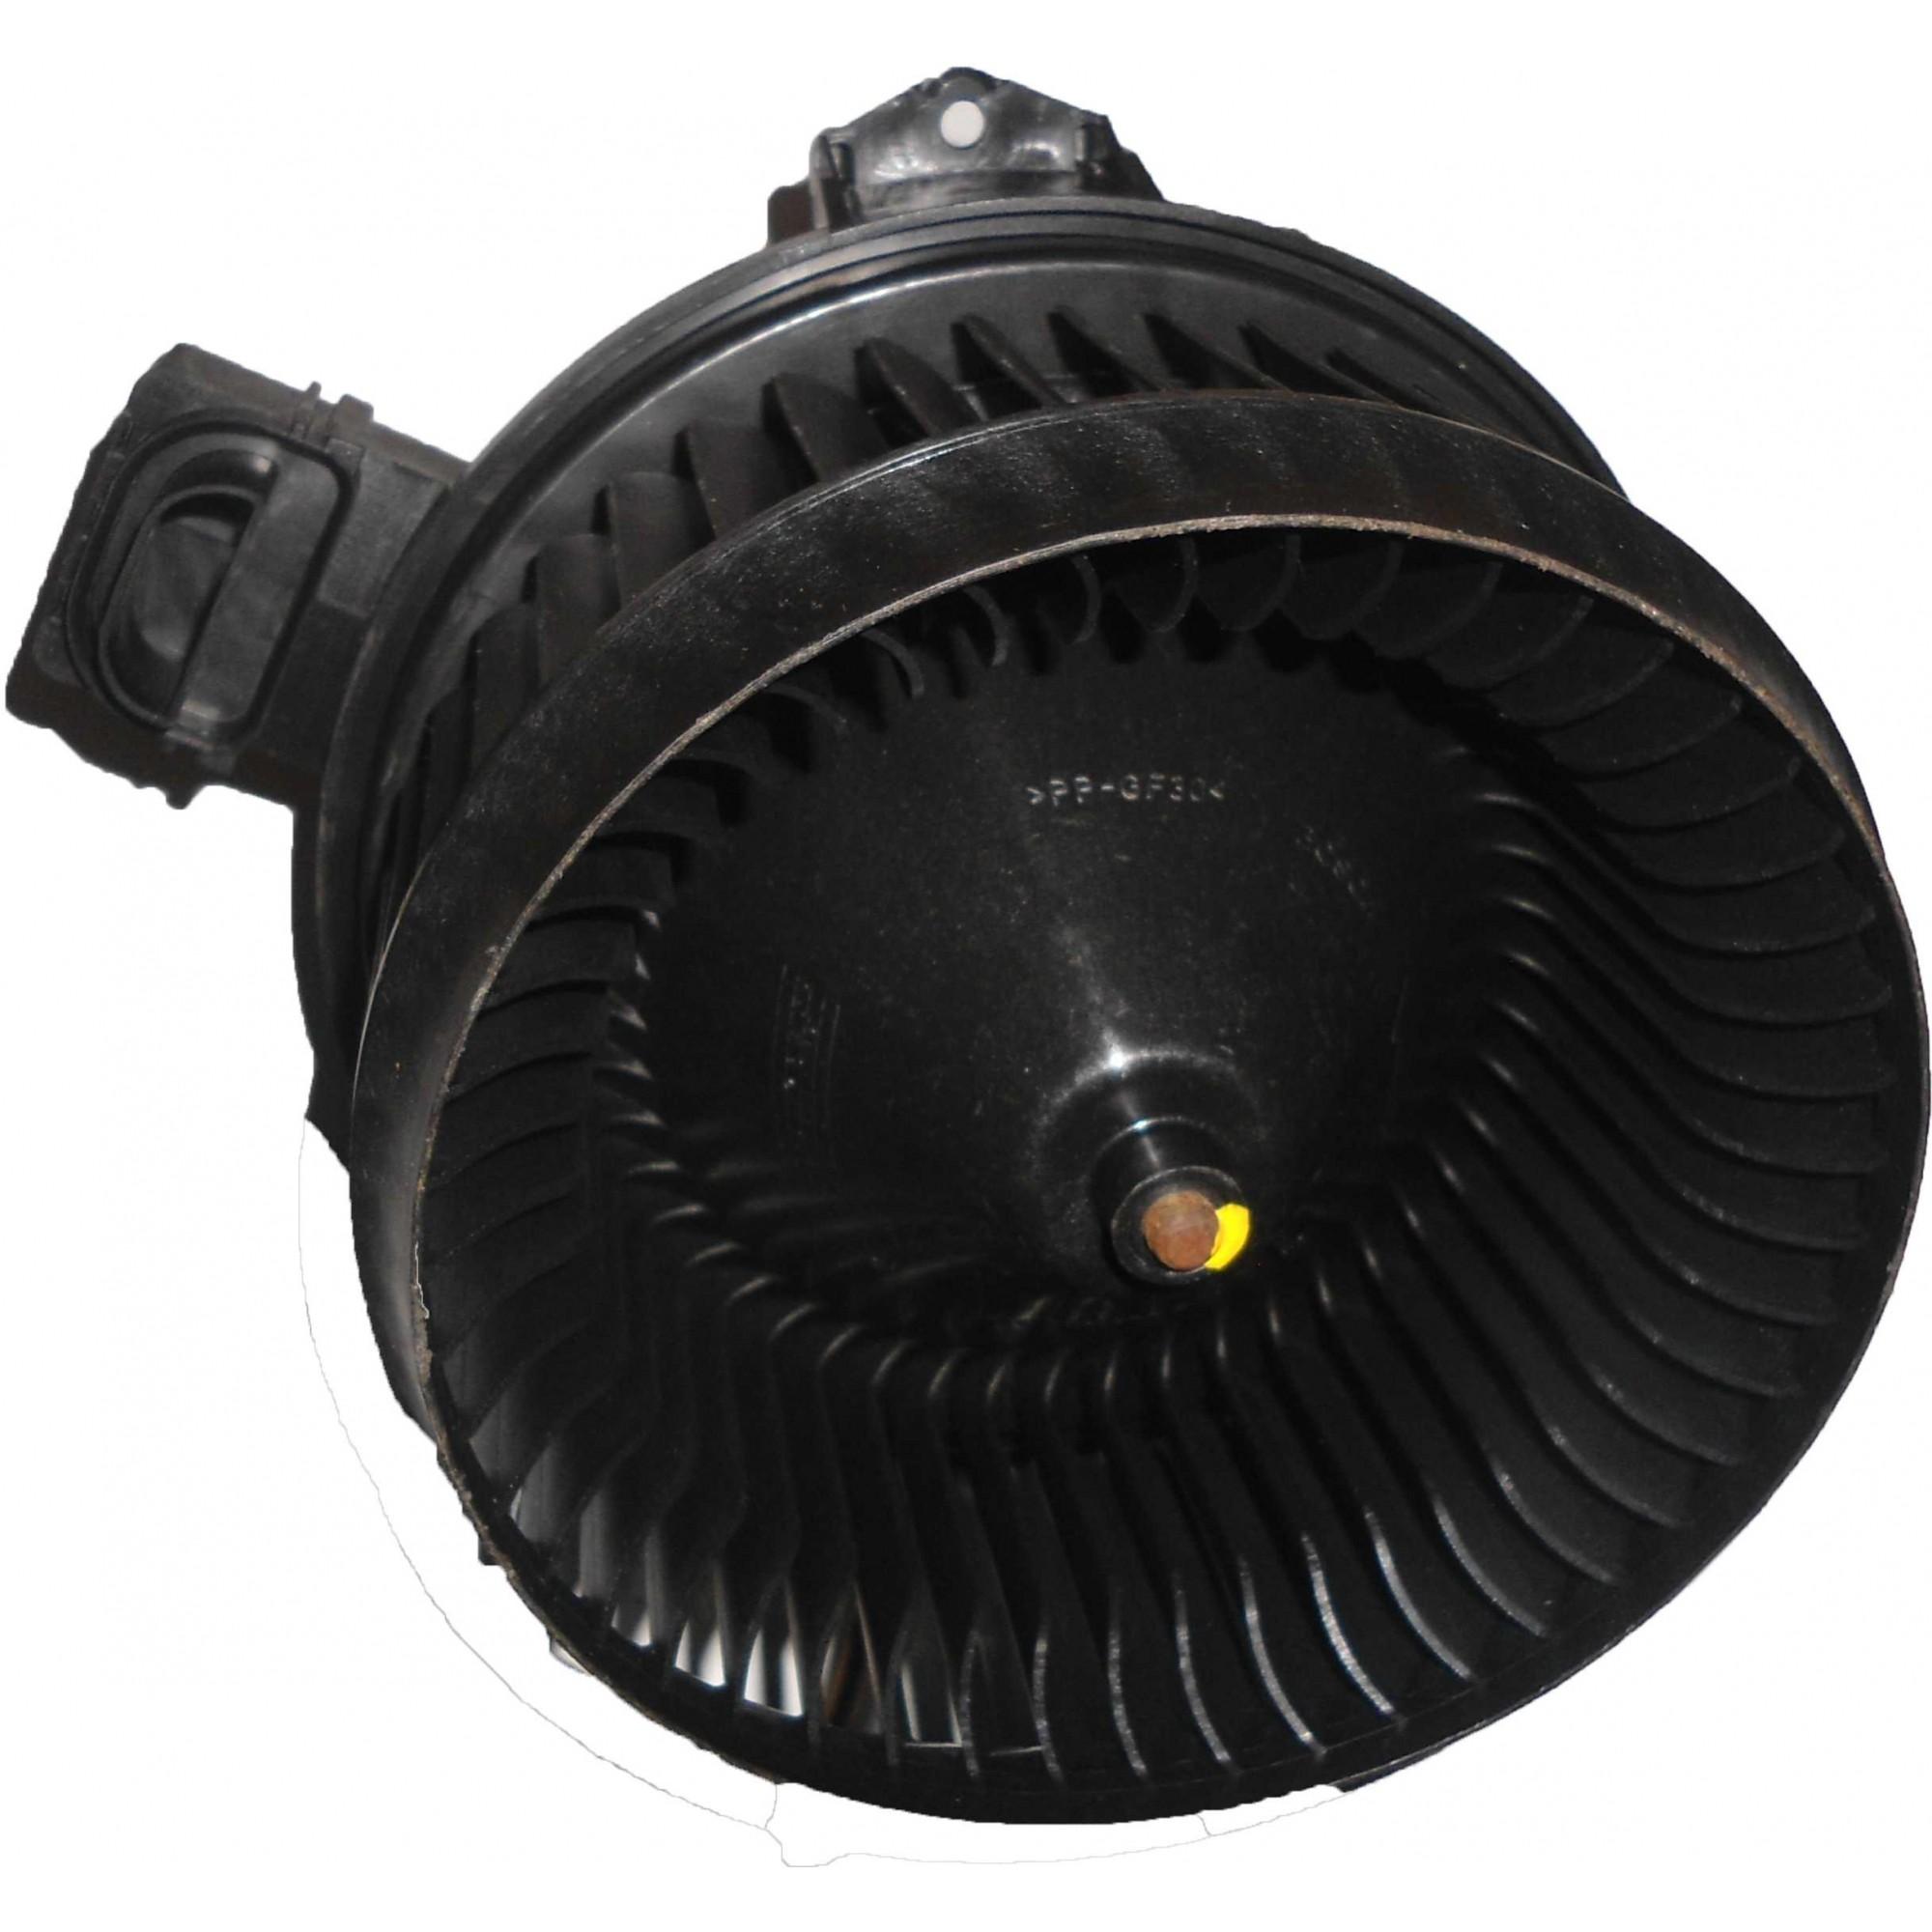 Motor Caixa Evaporadora - Civic 0711  Tirado De Caixa